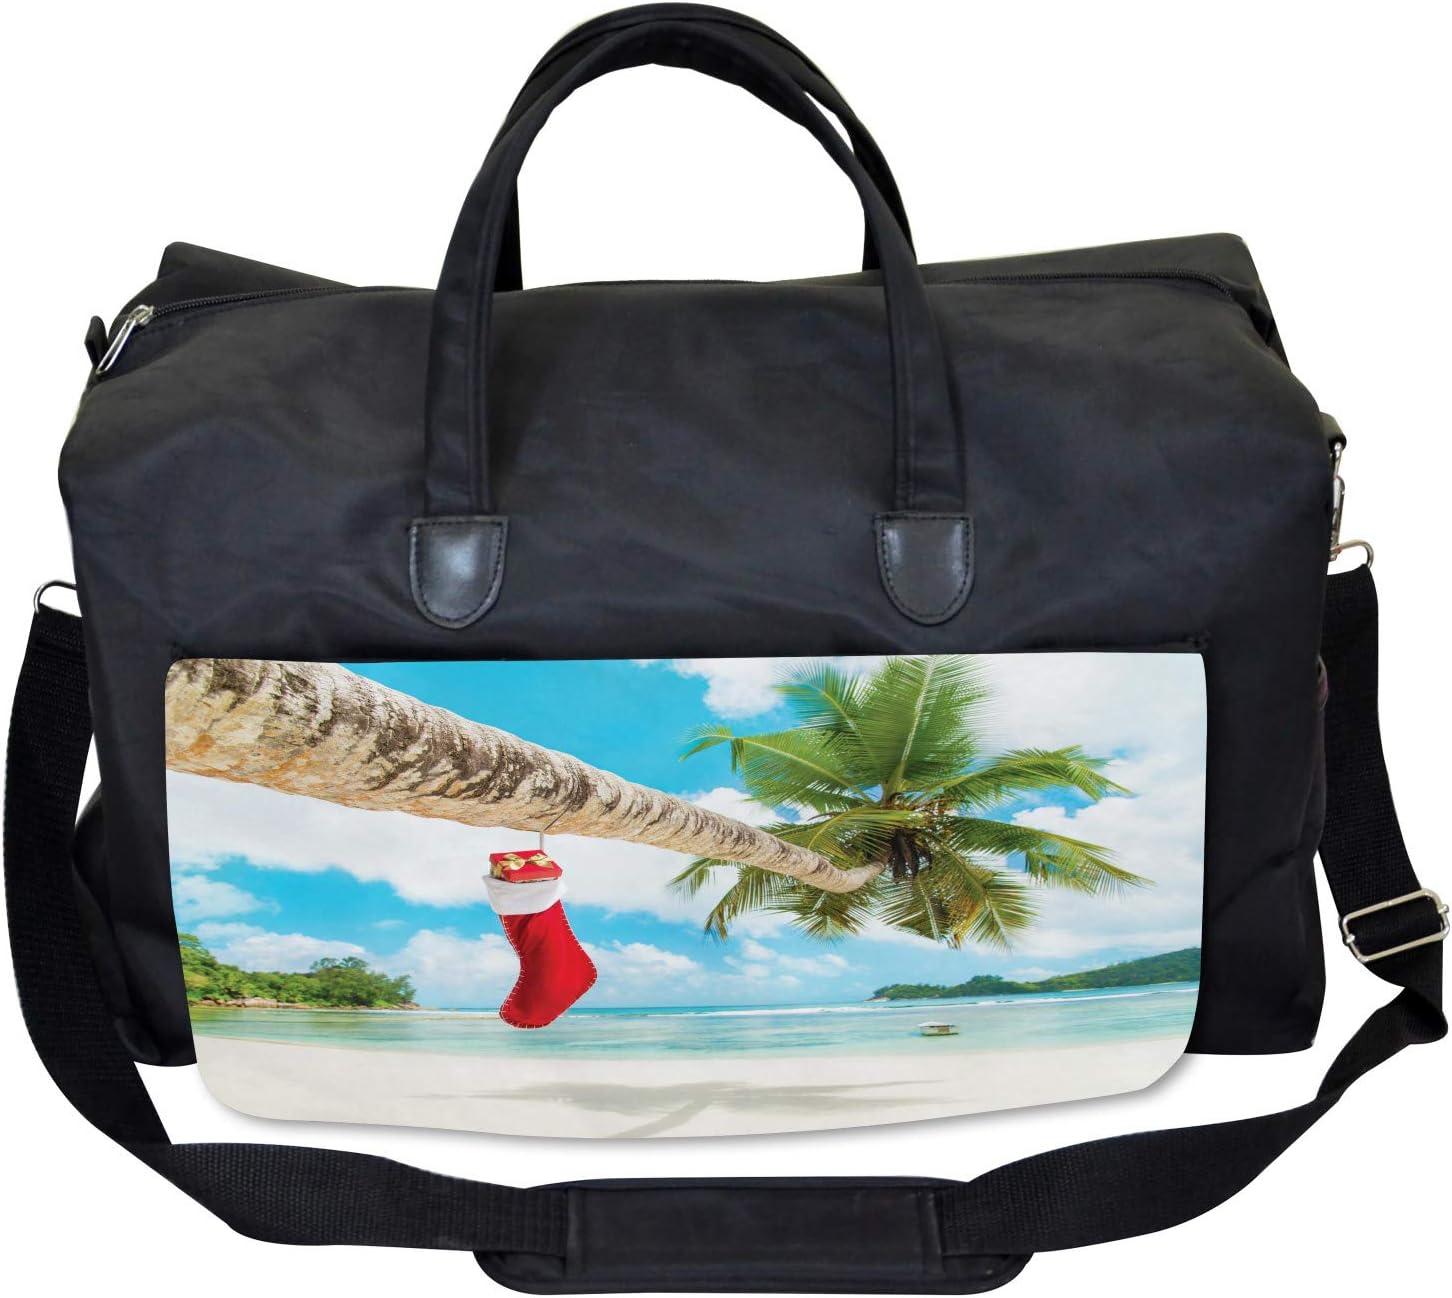 Ambesonne Christmas Gym Bag Beach Xmas Stockings Large Weekender Carry-on